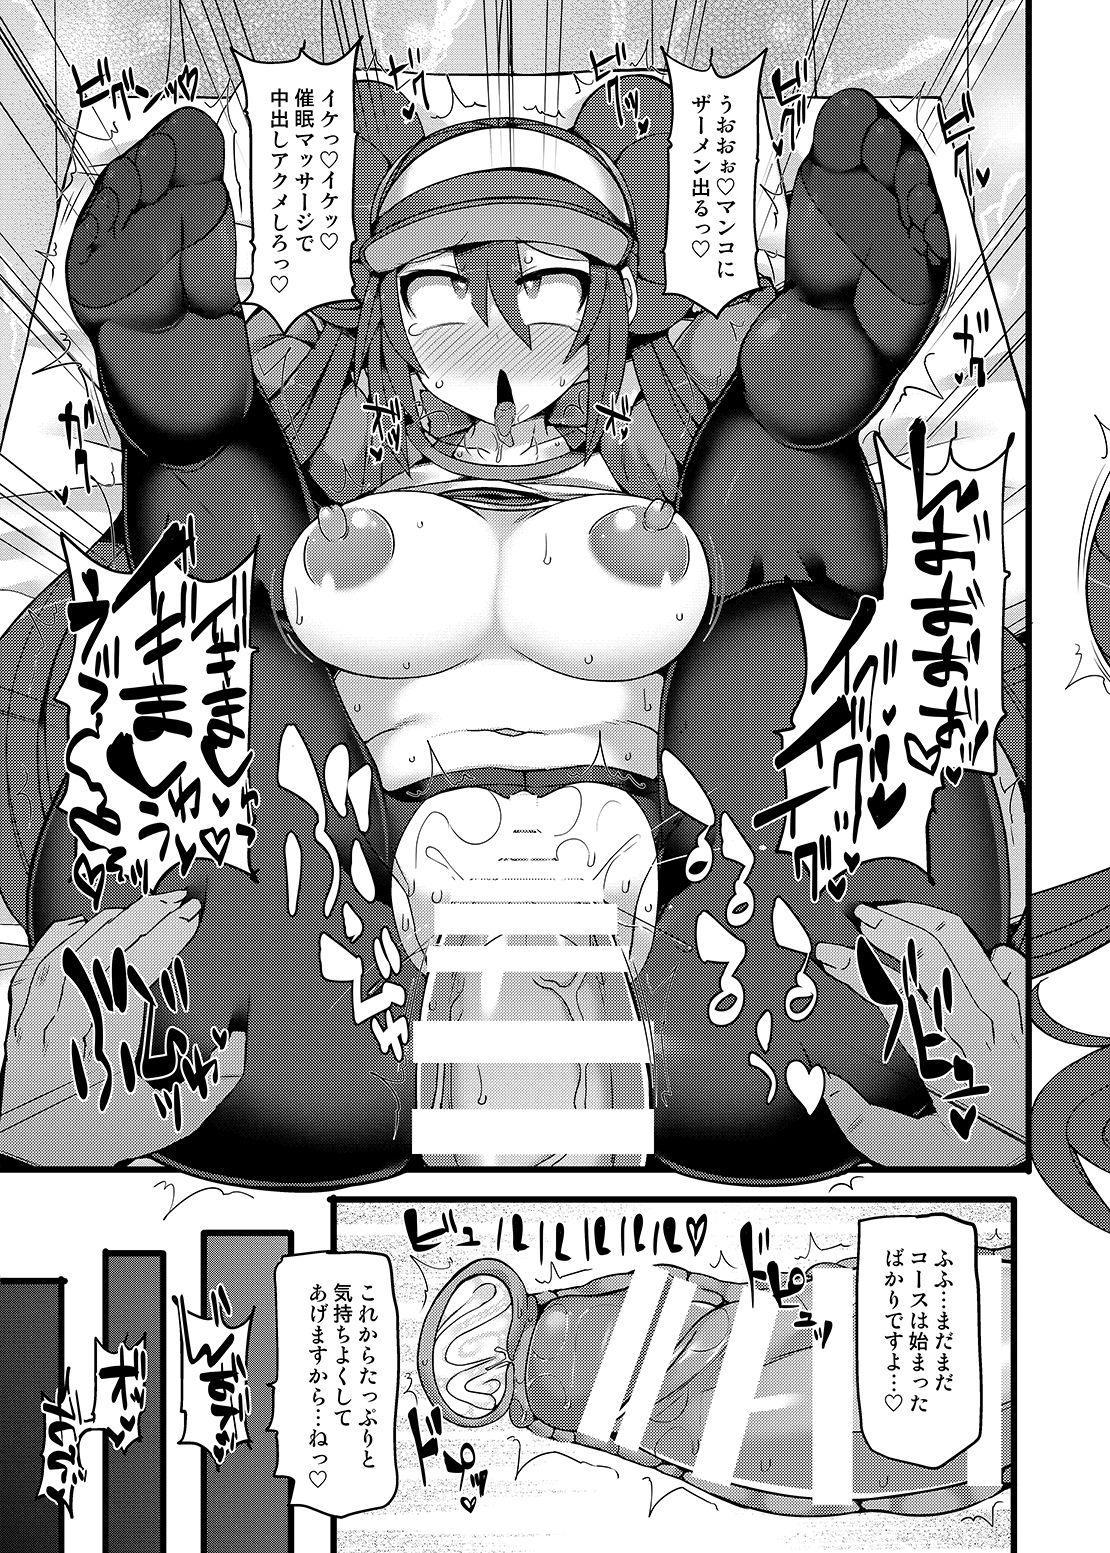 [Stapspats (Hisui)] Stapspats [Pocket Monster Saimin Series Soushuuhen] 1 Collective Hypnosis (Pokémon) [Digital] 127